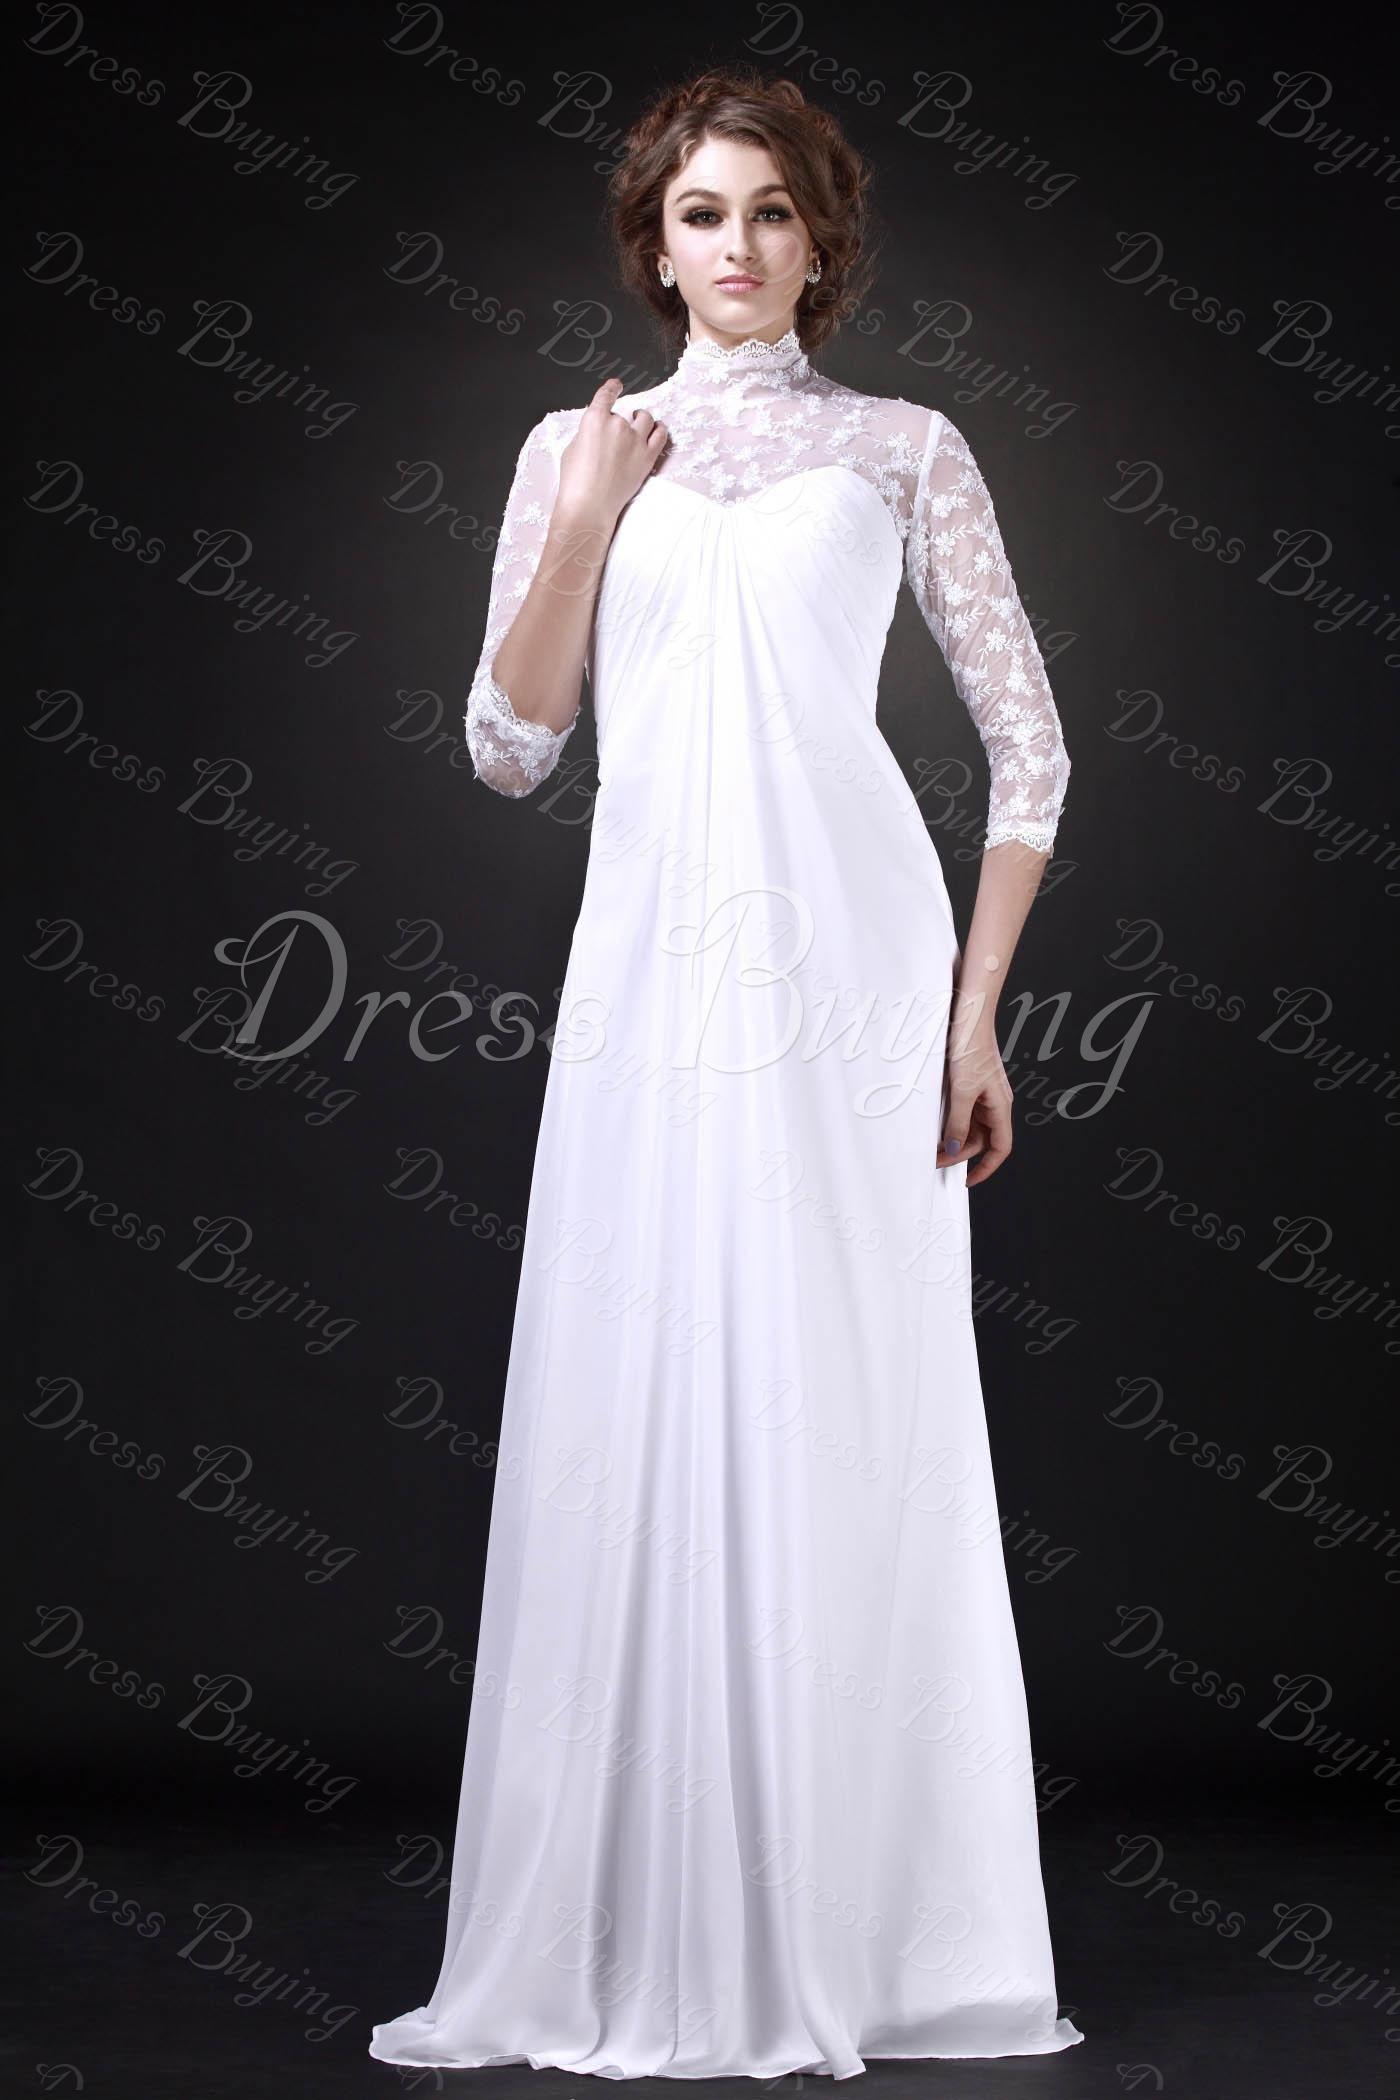 Fabulous high neck length sleeves floor length roxyus wedding